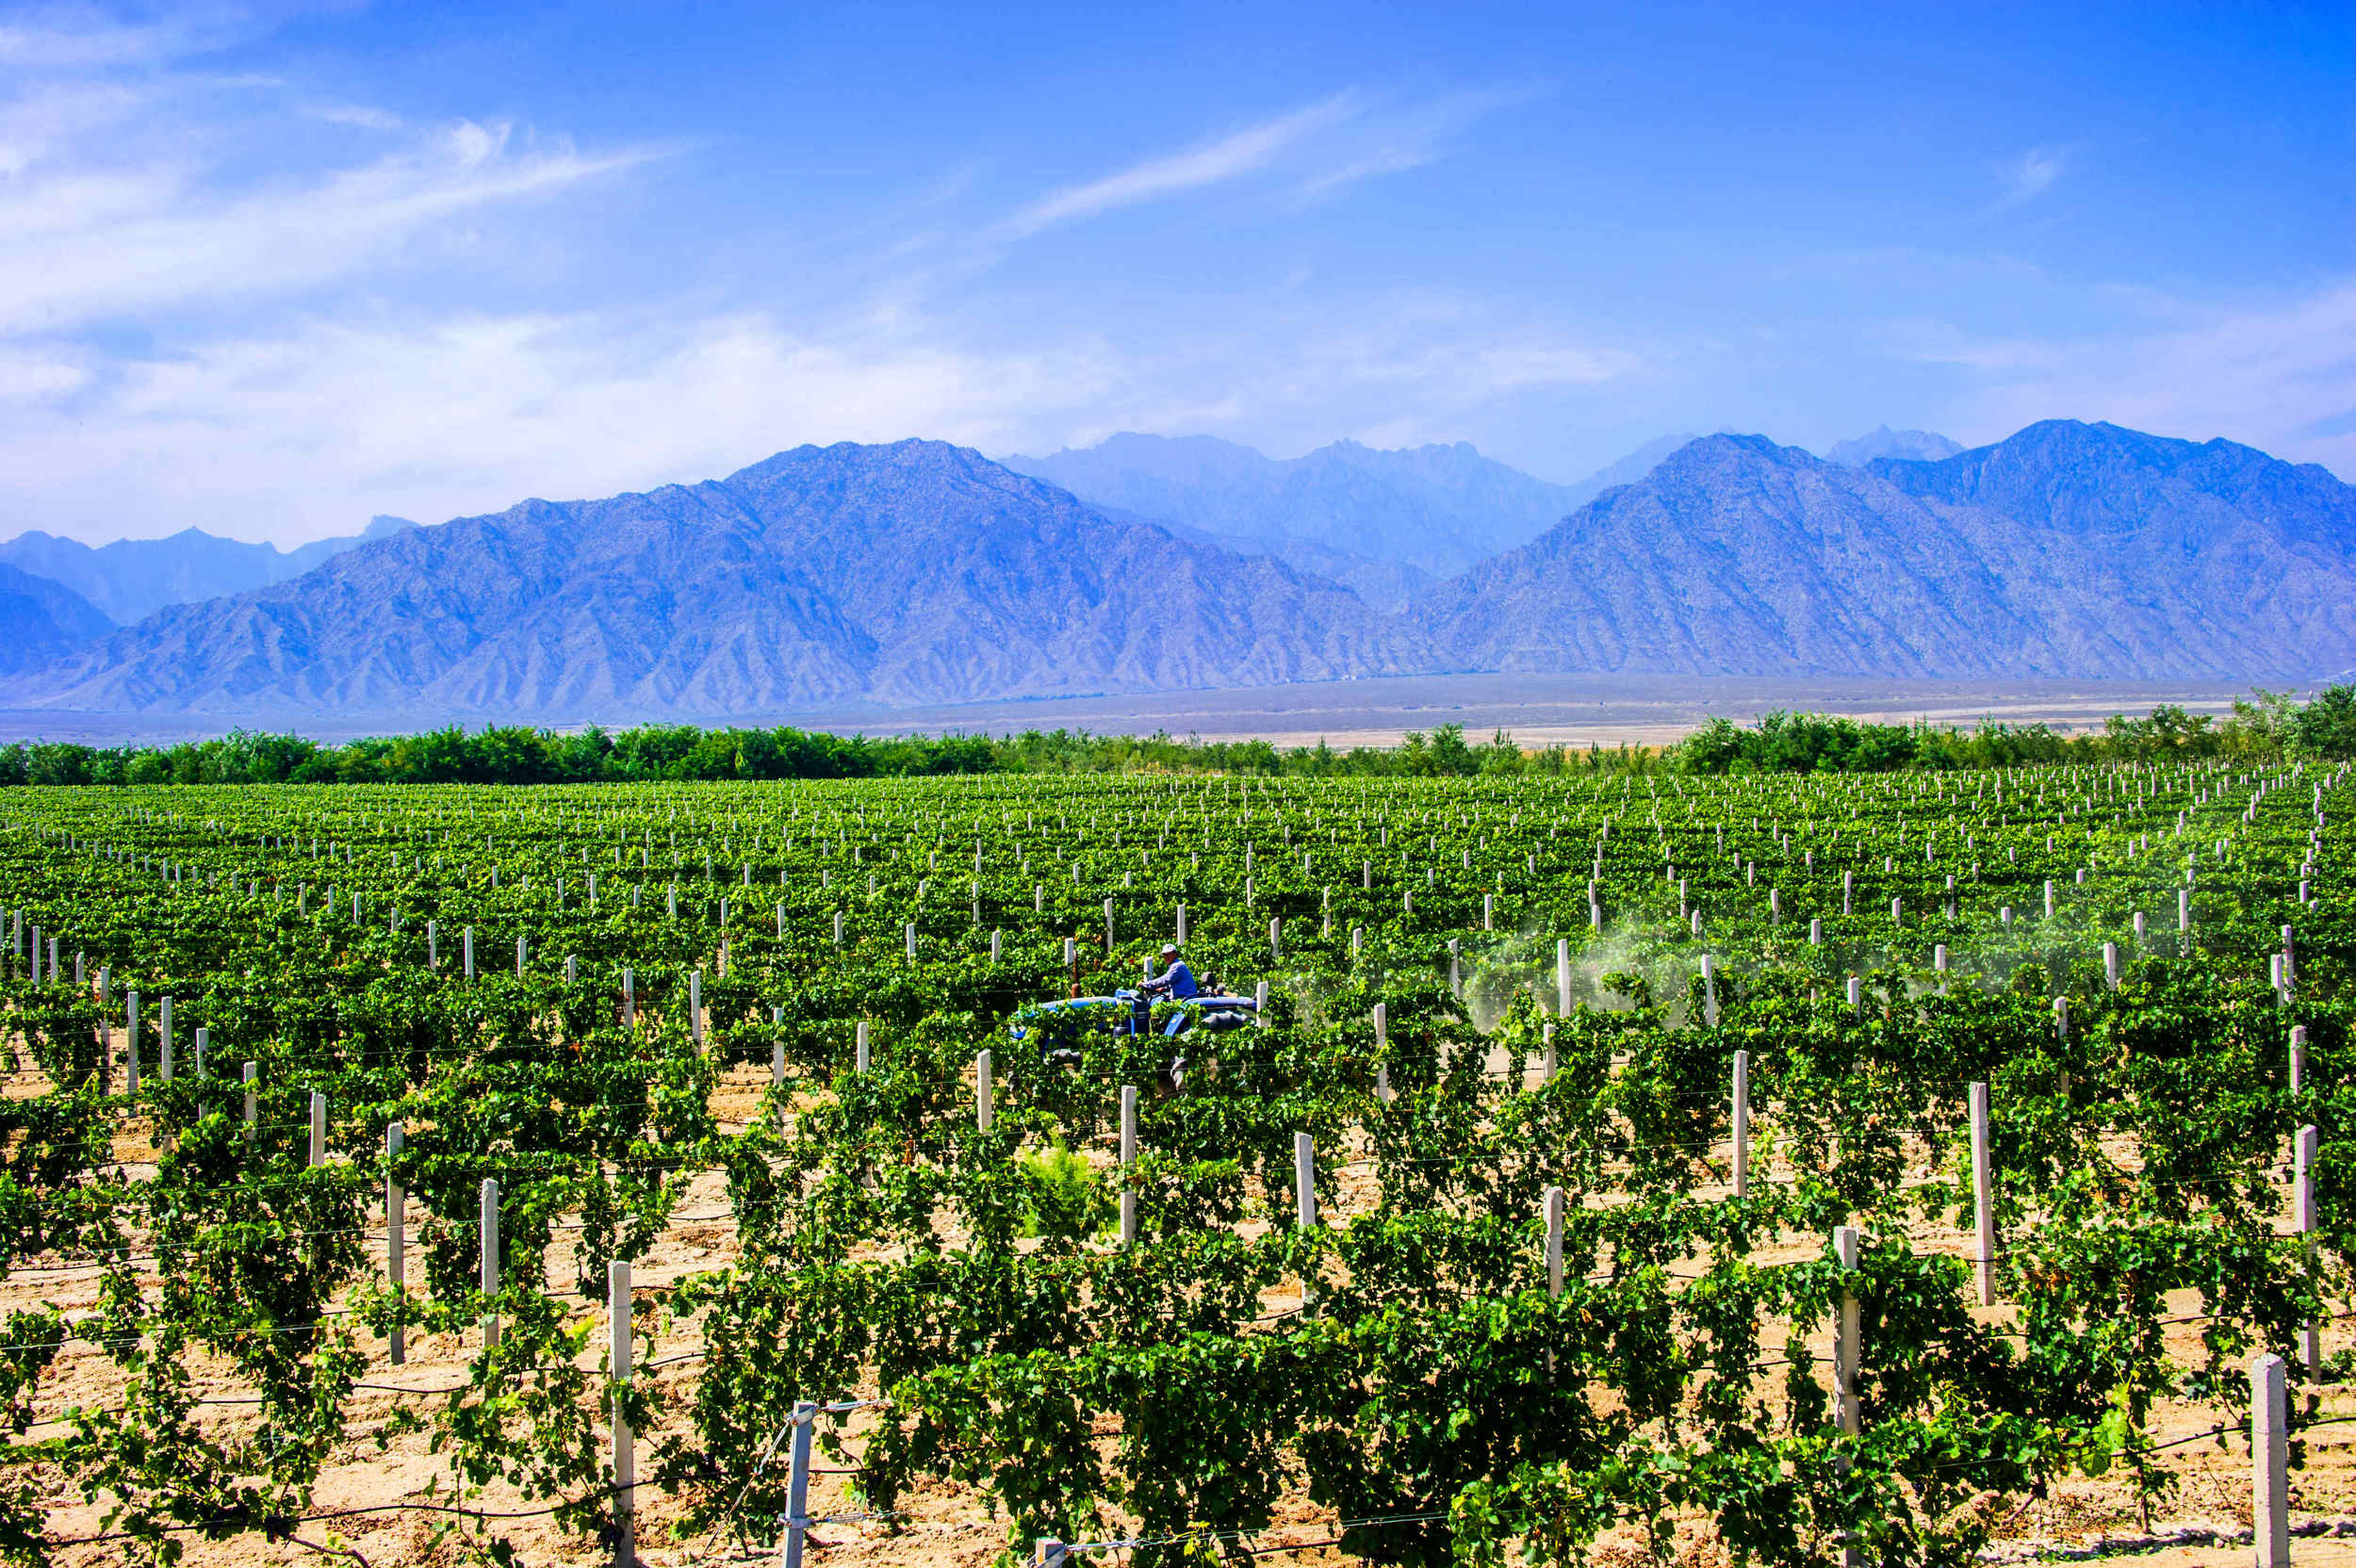 Ningxia wine region Himalayas